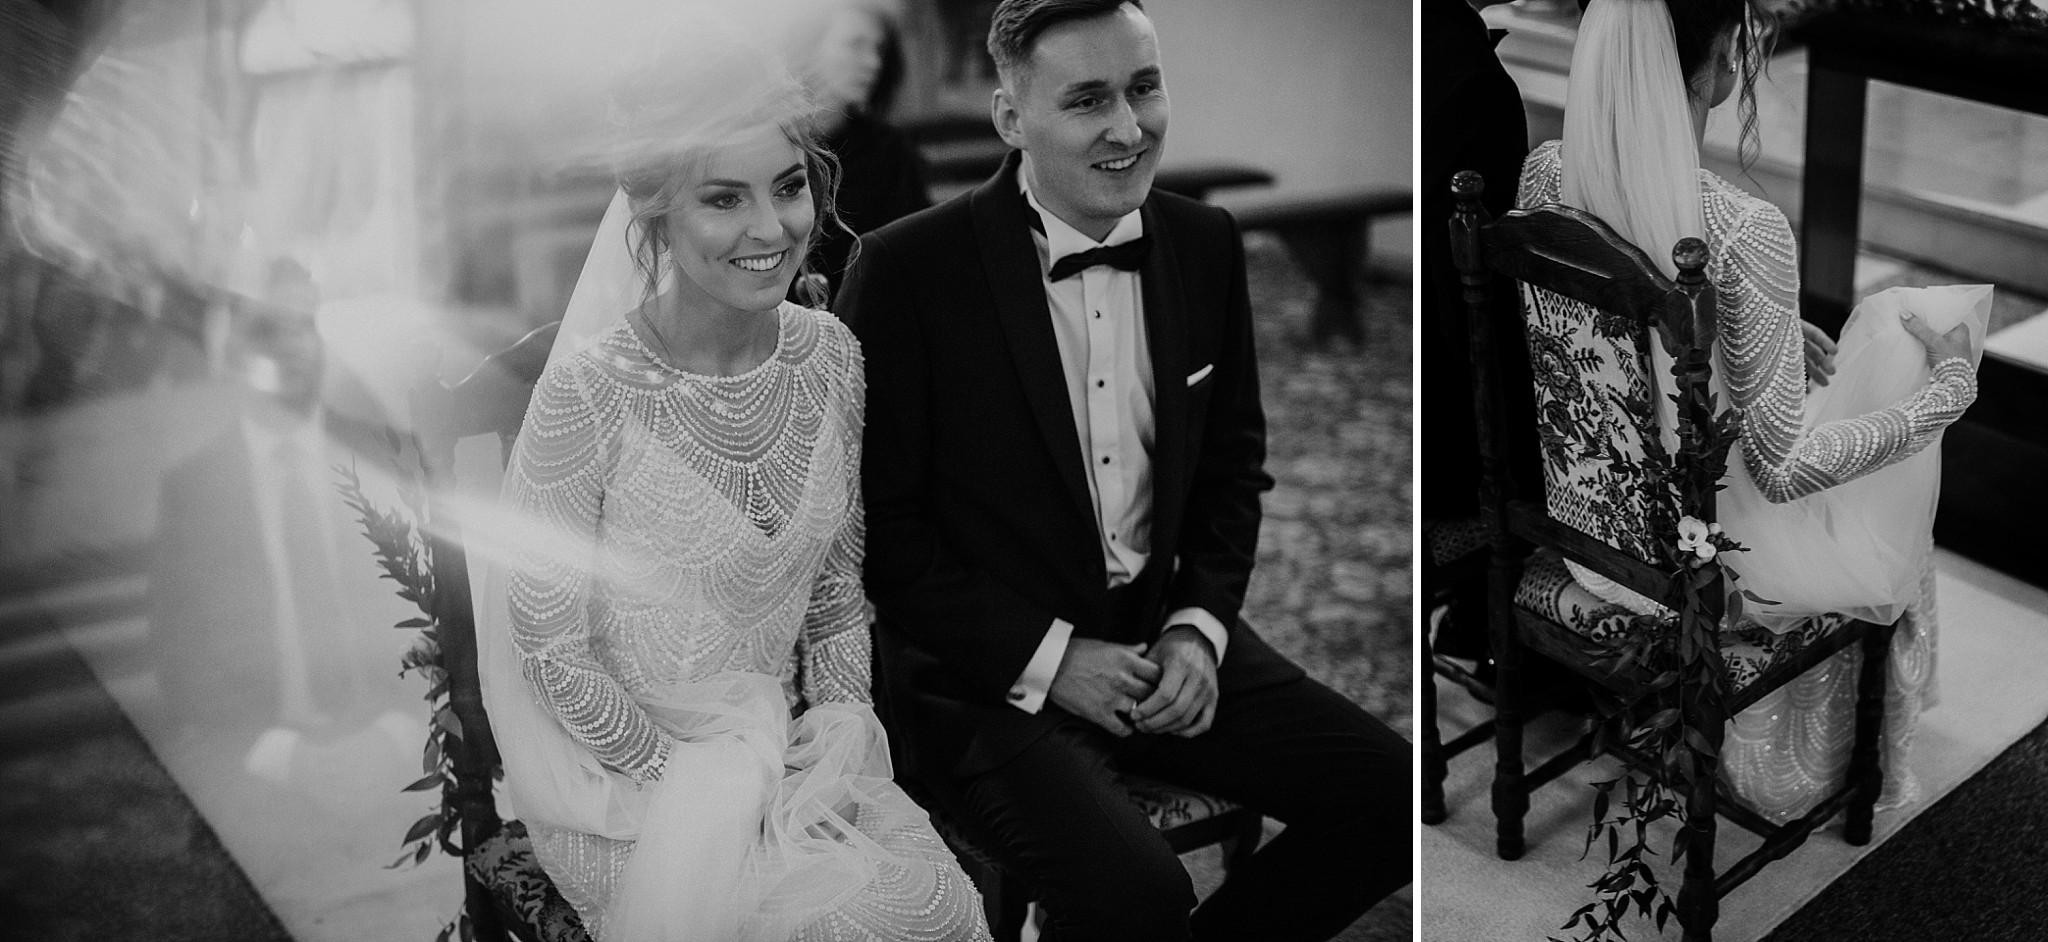 fotograf poznan wesele dobra truskawka piekne wesele pod poznaniem wesele w dobrej truskawce piekna para mloda slub marzen slub koronawirus slub listopad wesele koronawirus 187